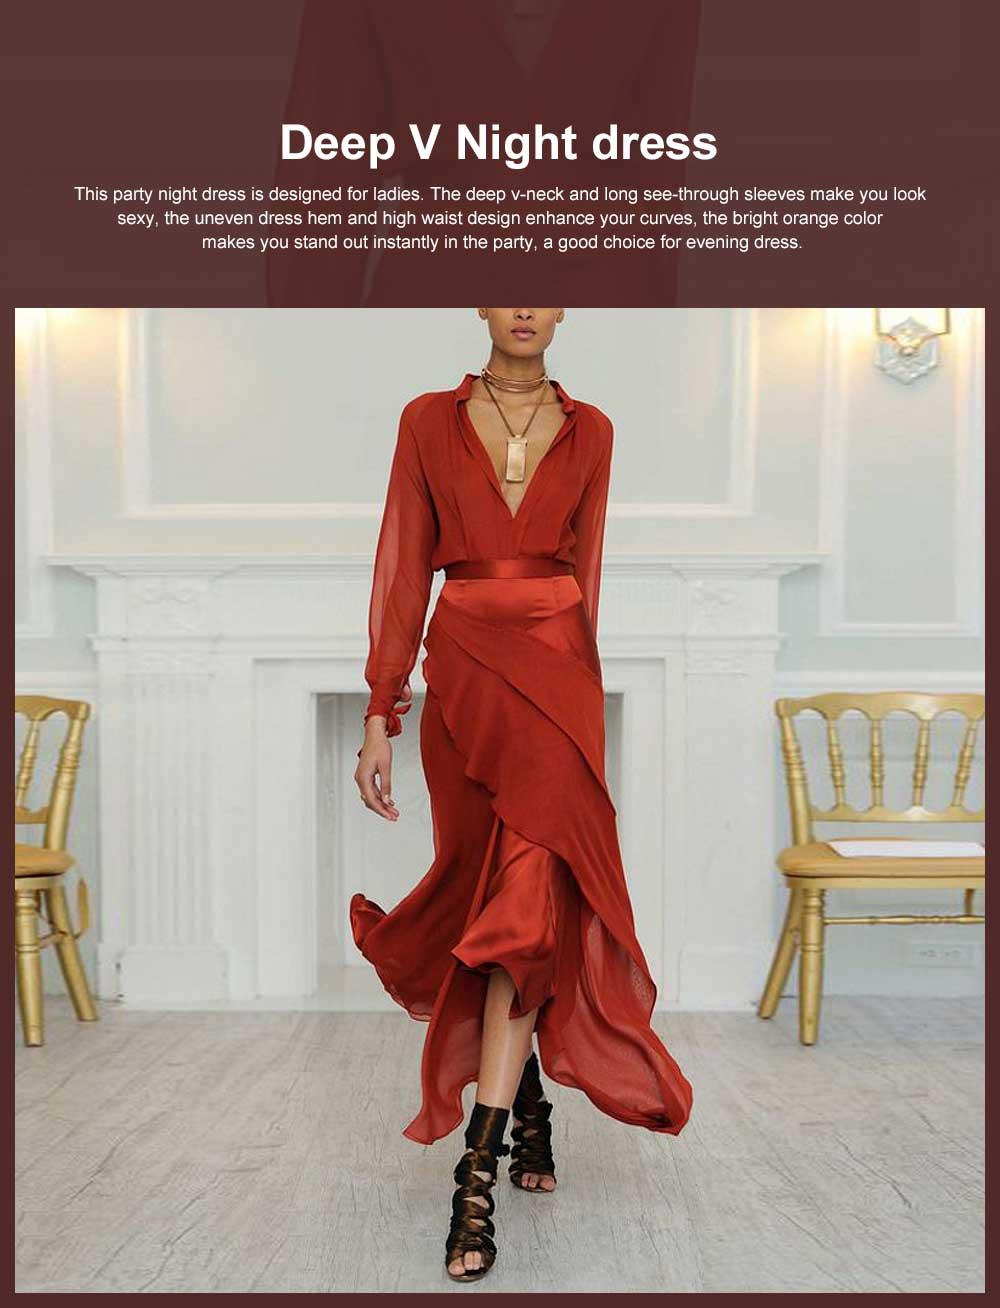 Party Night Dress for Women, Sexy Deep V-neck Long Sleeve Evening Maxi Dress 0